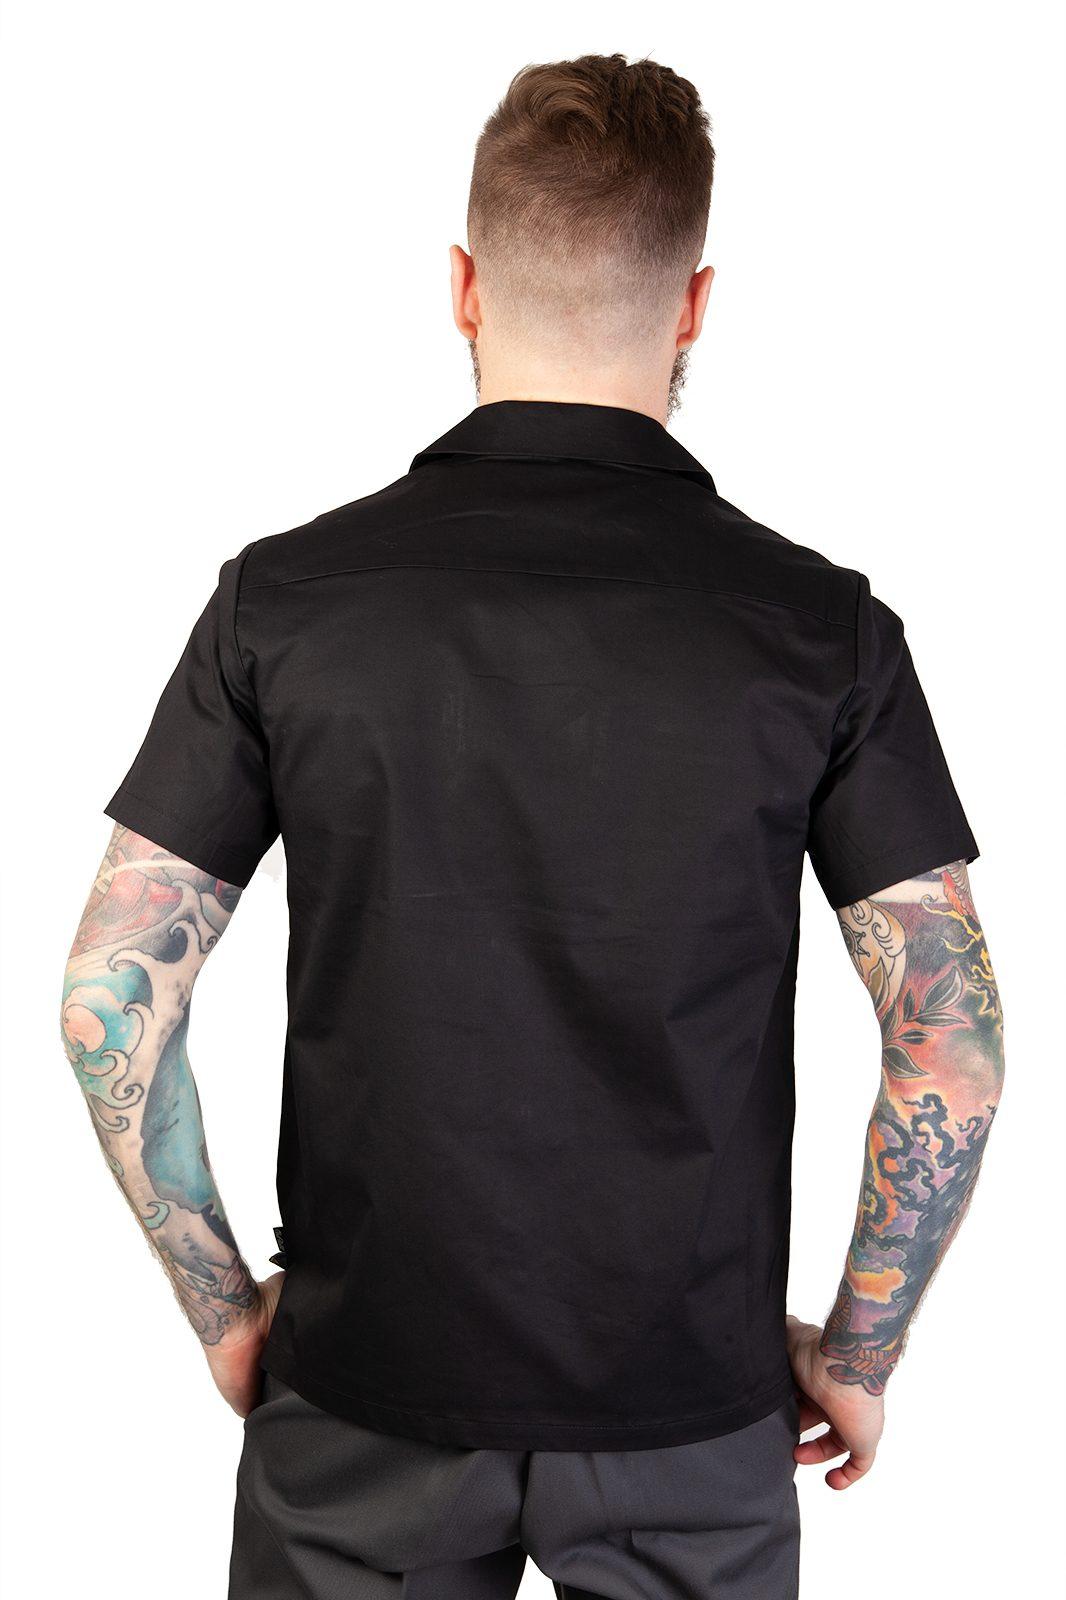 Donnie Bowling Shirt Black